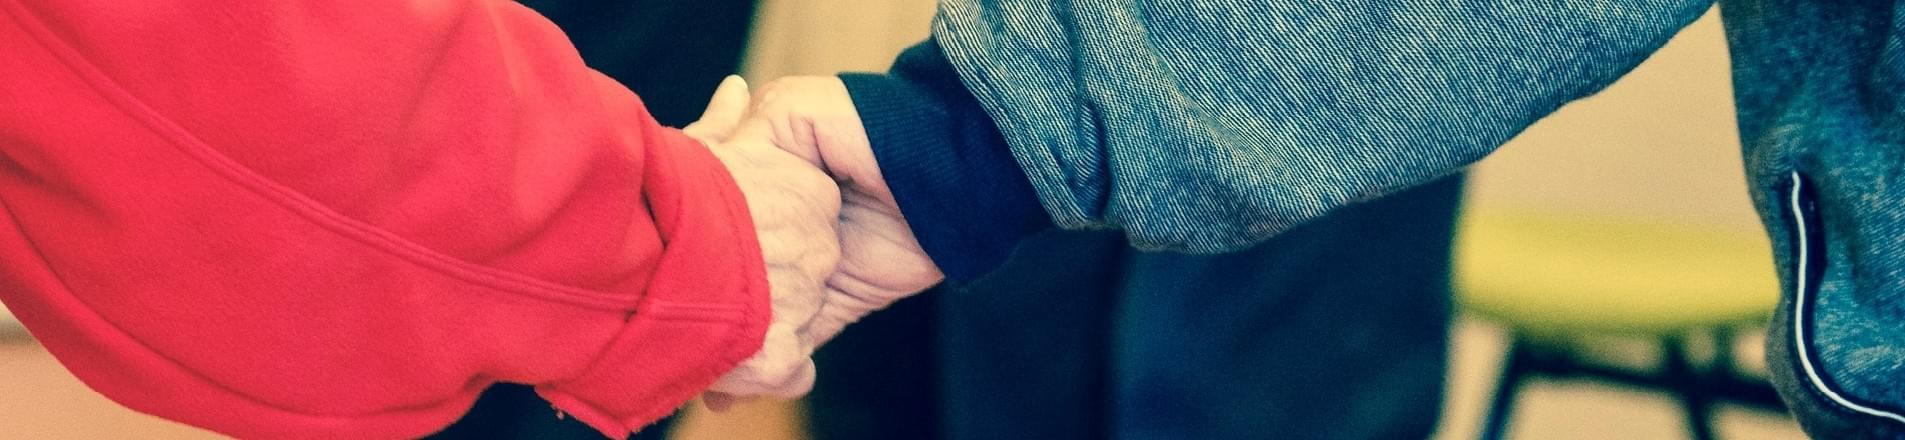 1/3 of organisations provide carer support